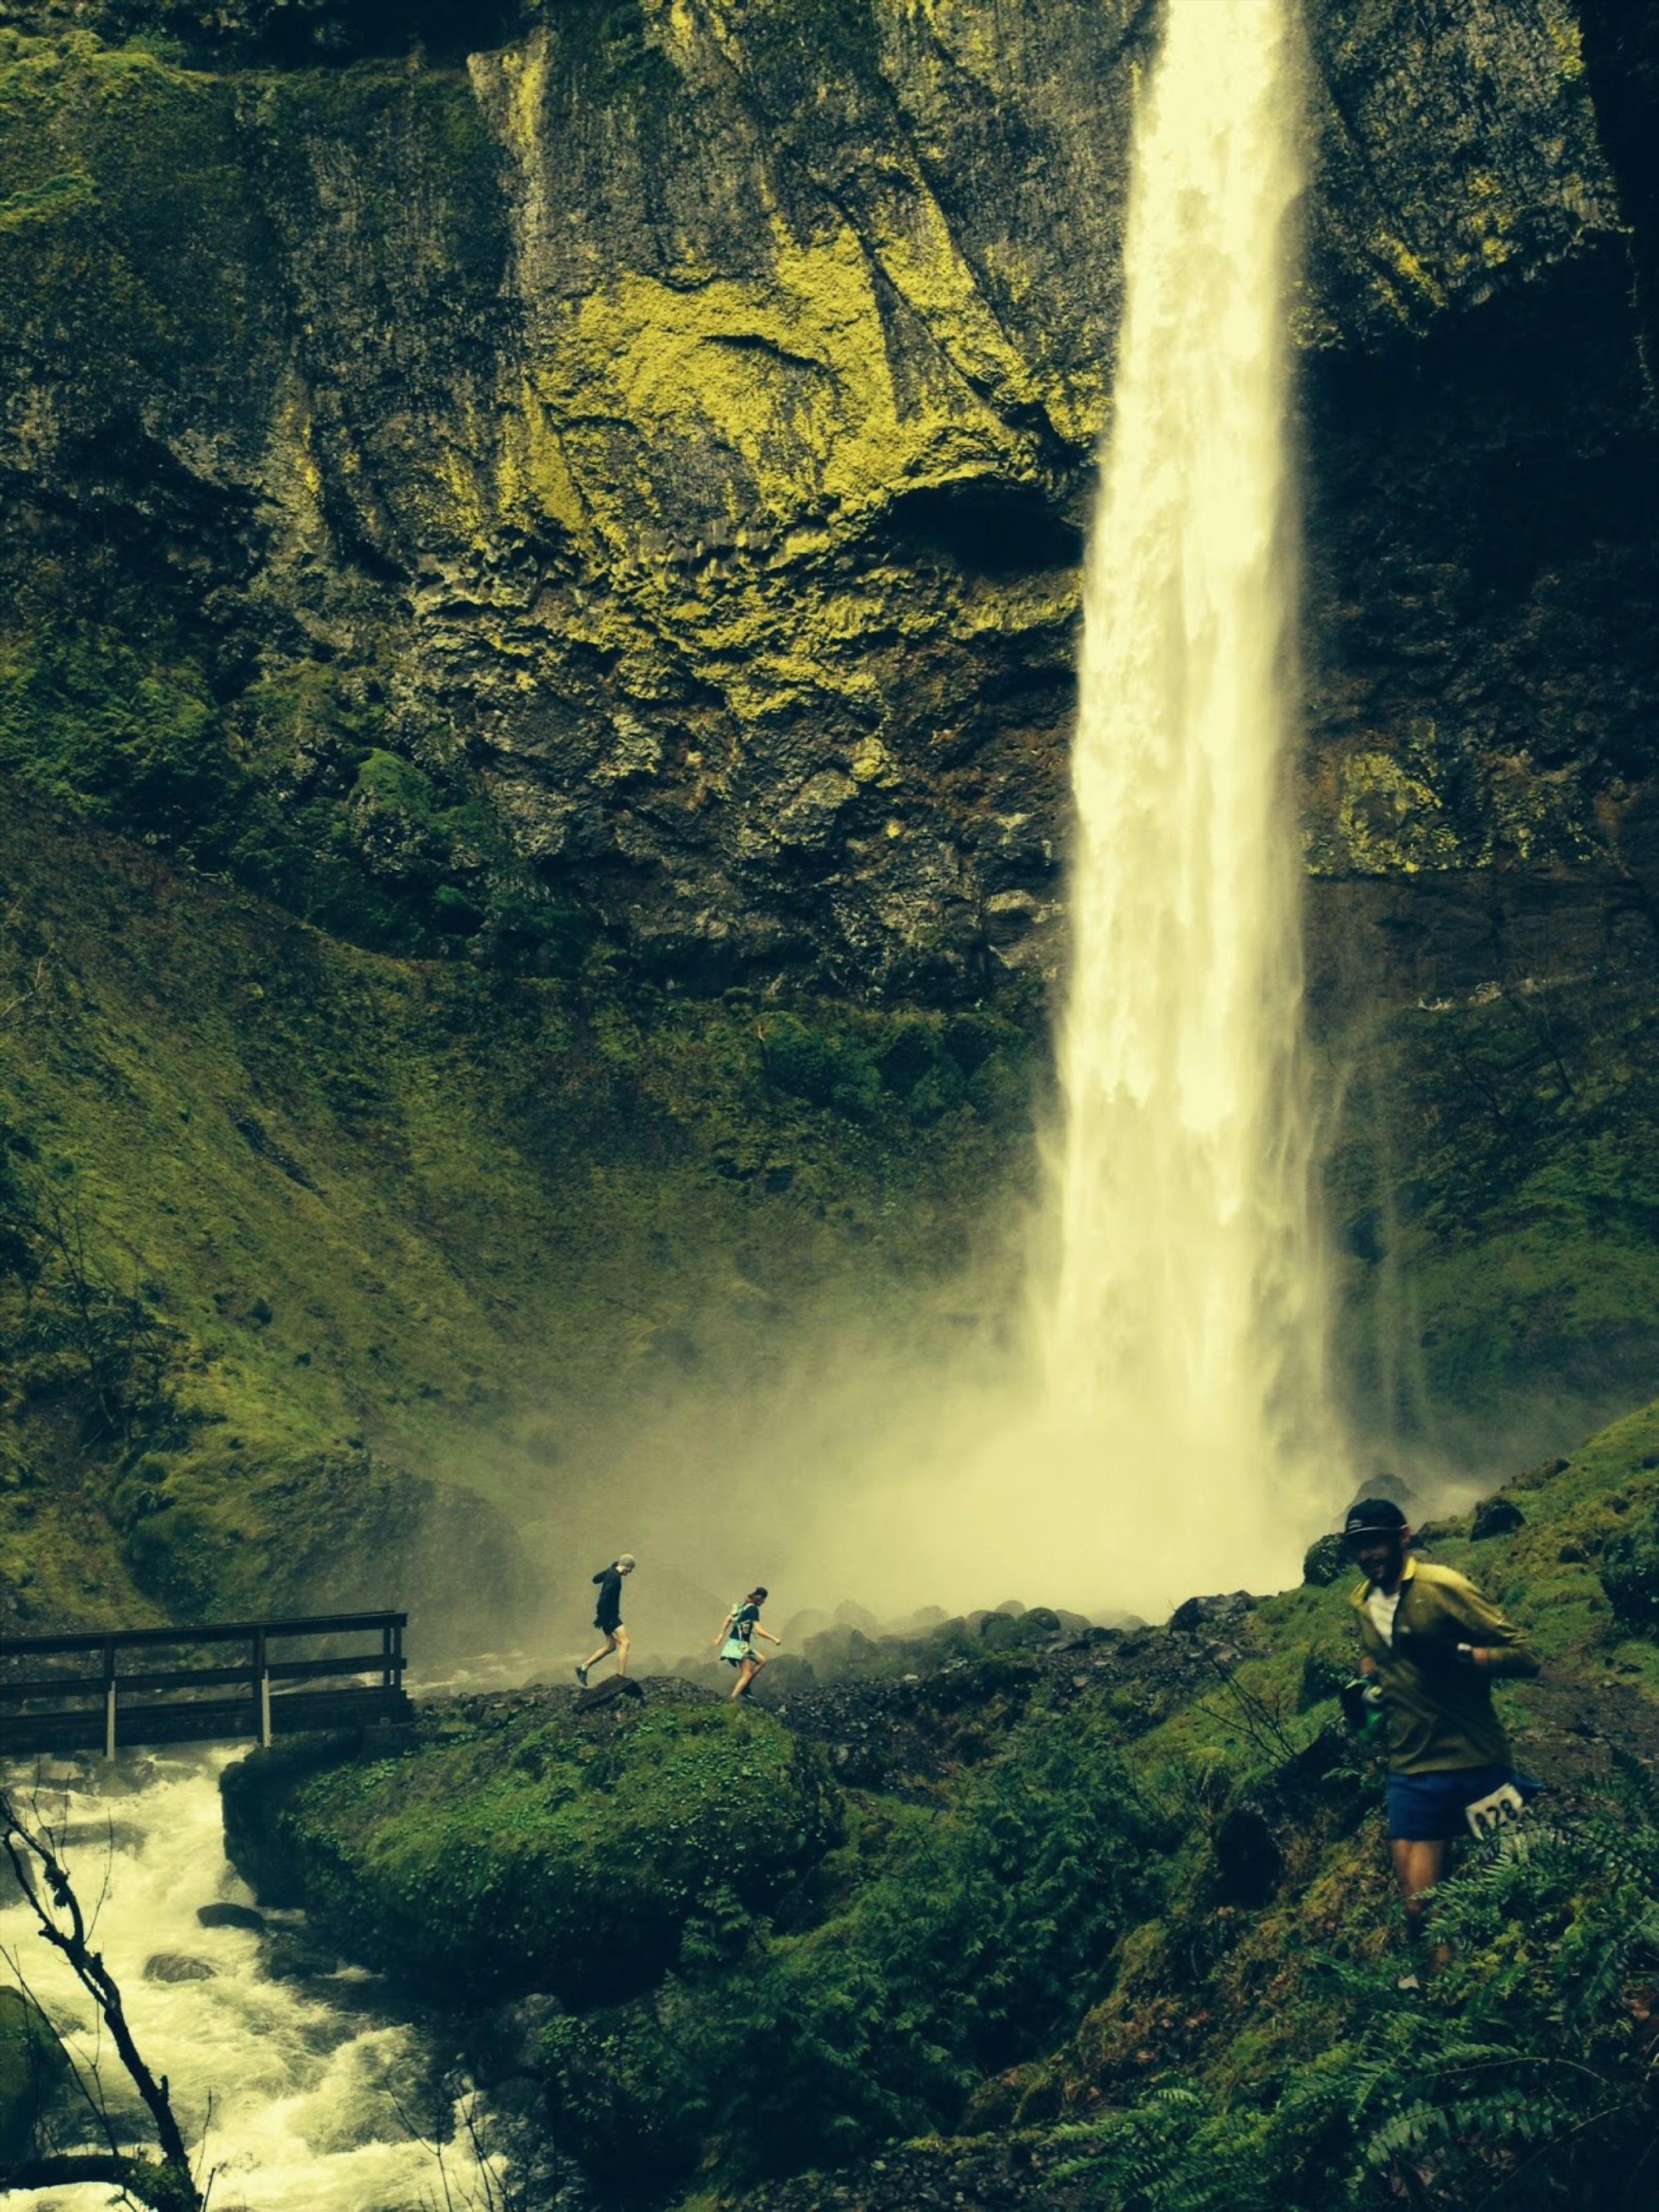 Photo credit: Ryan Ledd, Gorge Waterfalls 2014.